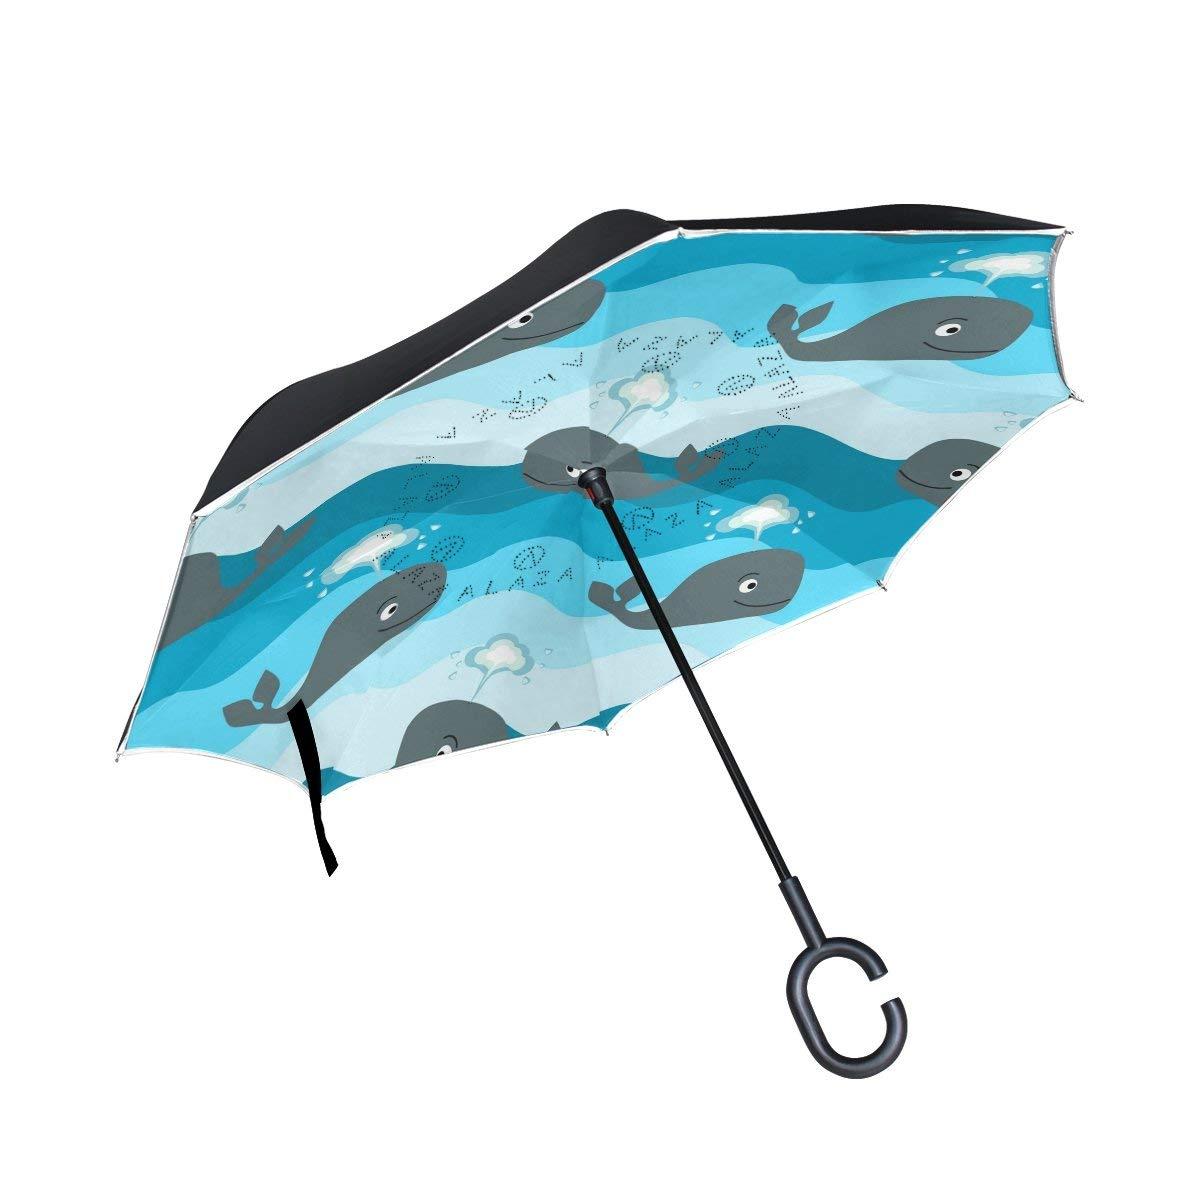 cad0925c2f29 Cheap 8k Straight Blue Umbrella, find 8k Straight Blue Umbrella ...